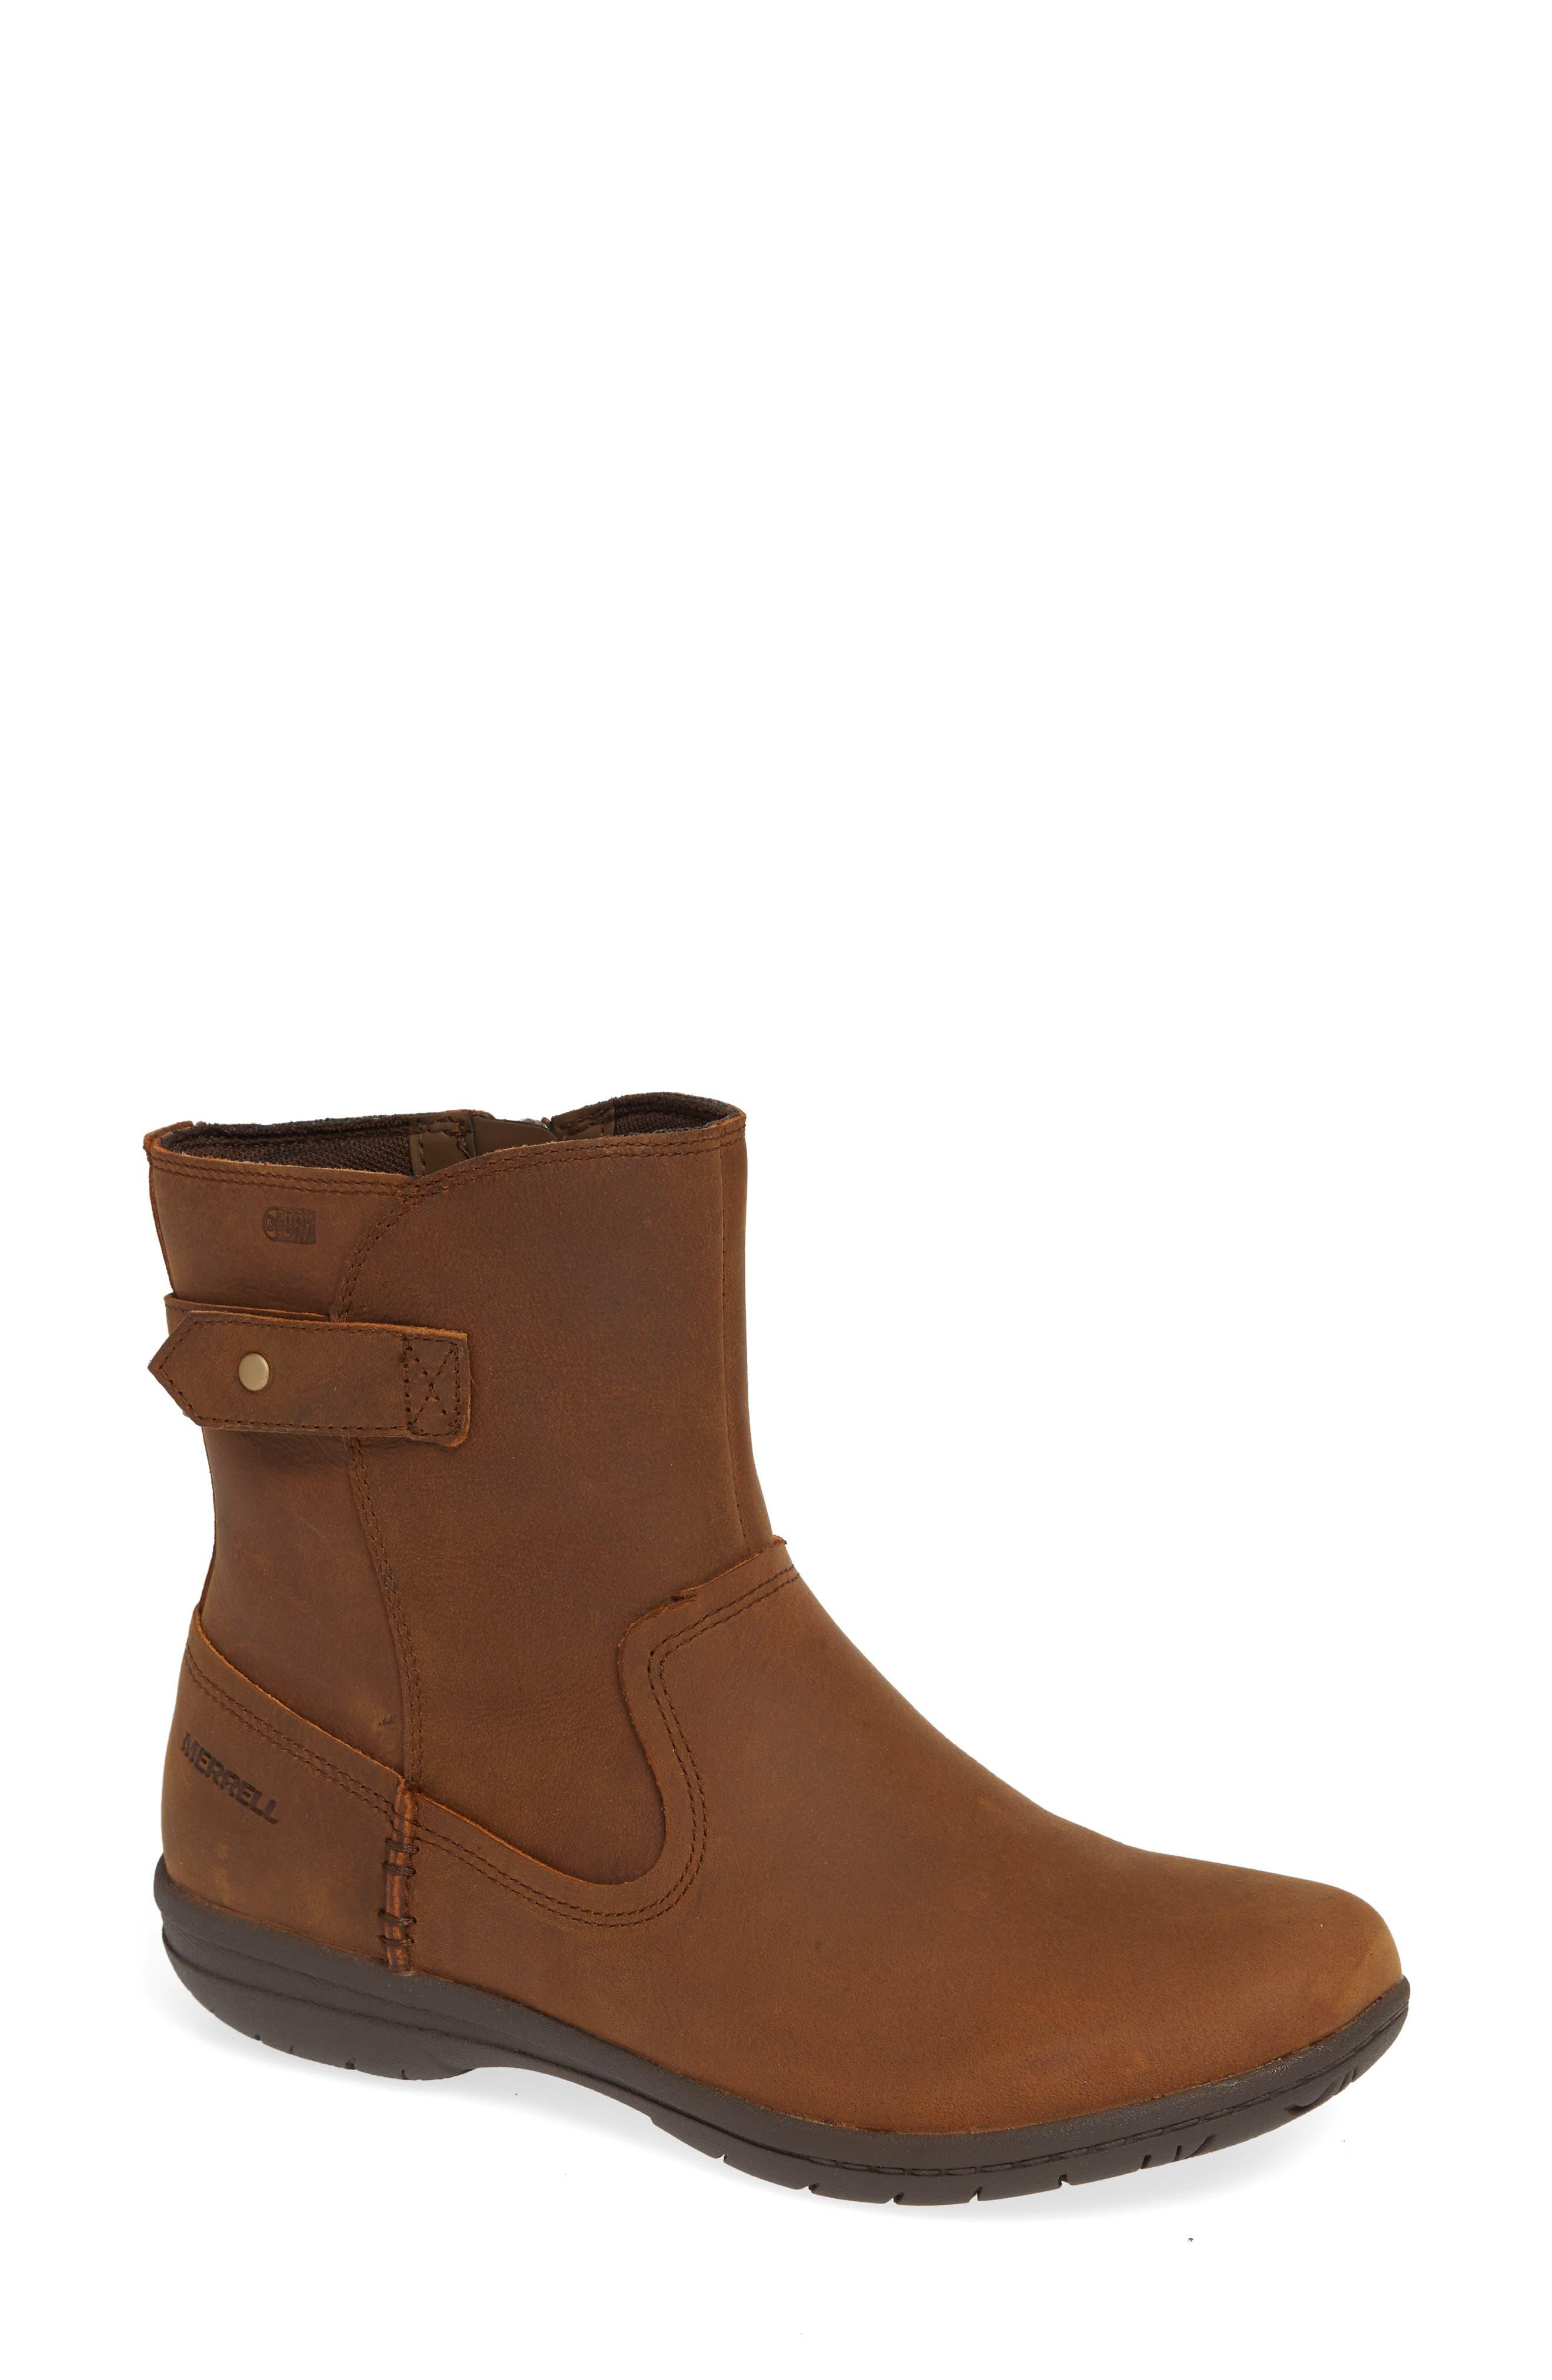 Merrell Kassie Waterproof Bootie, Brown